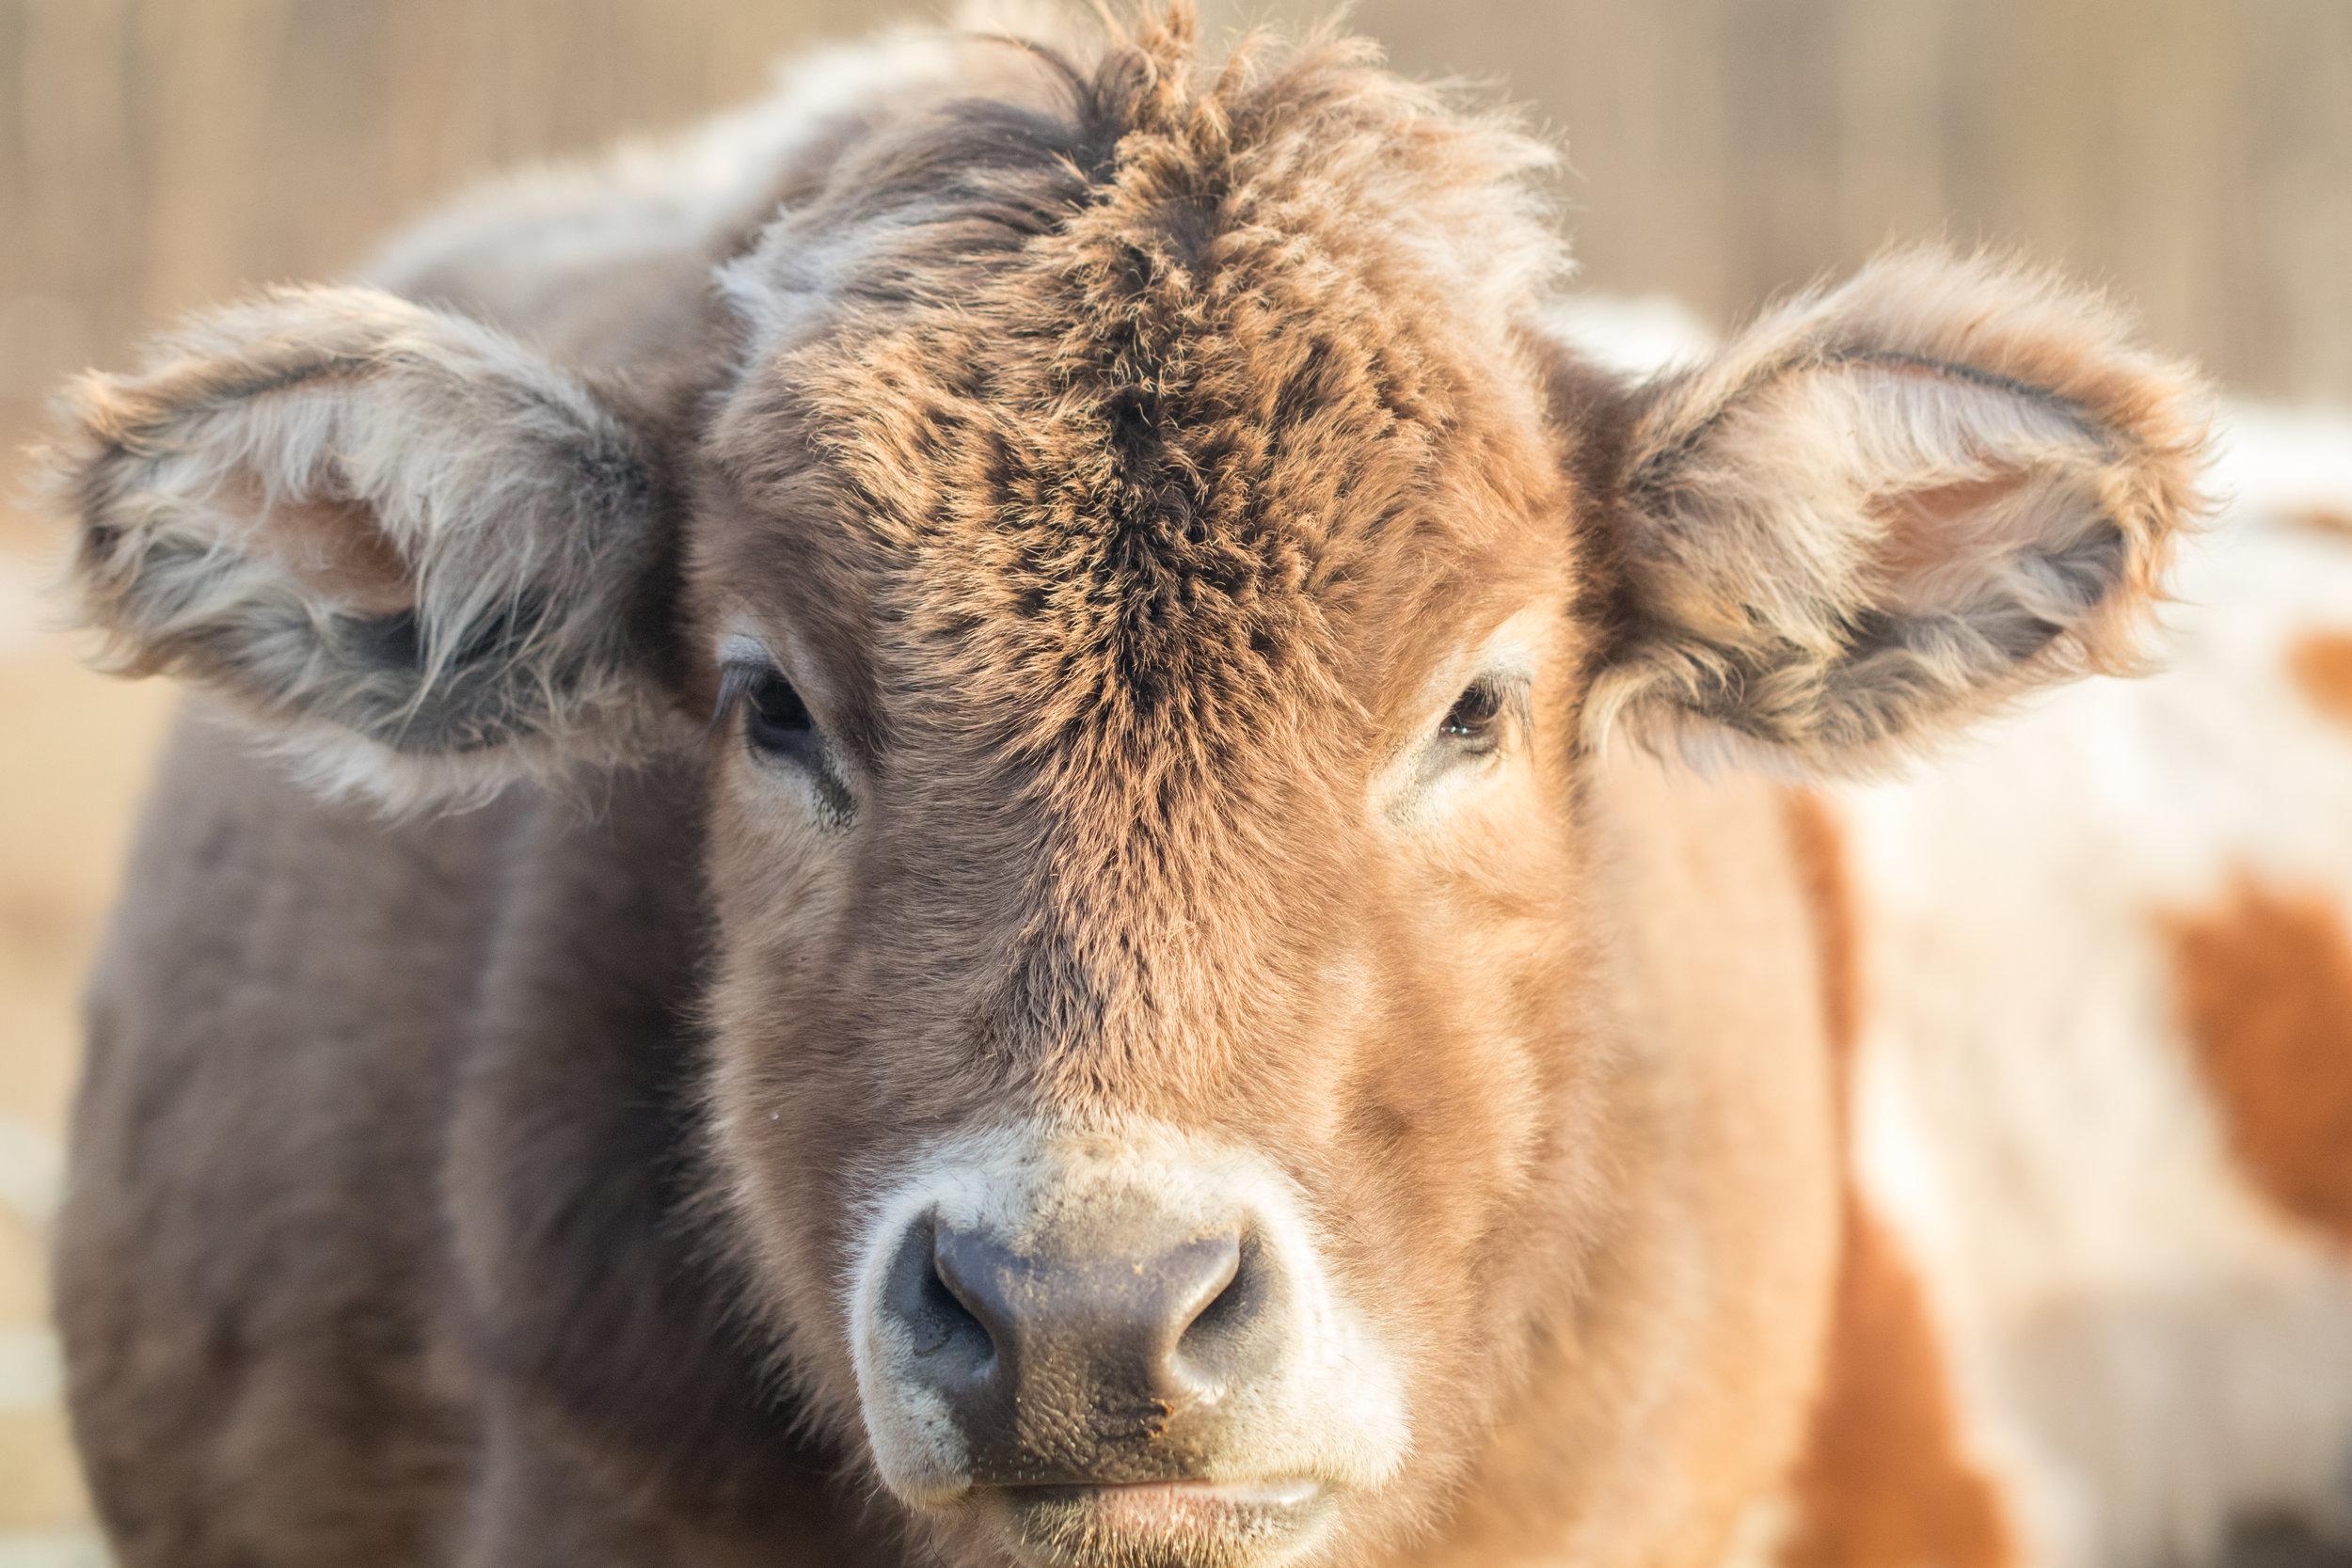 Cows 2-11-19-6.jpg